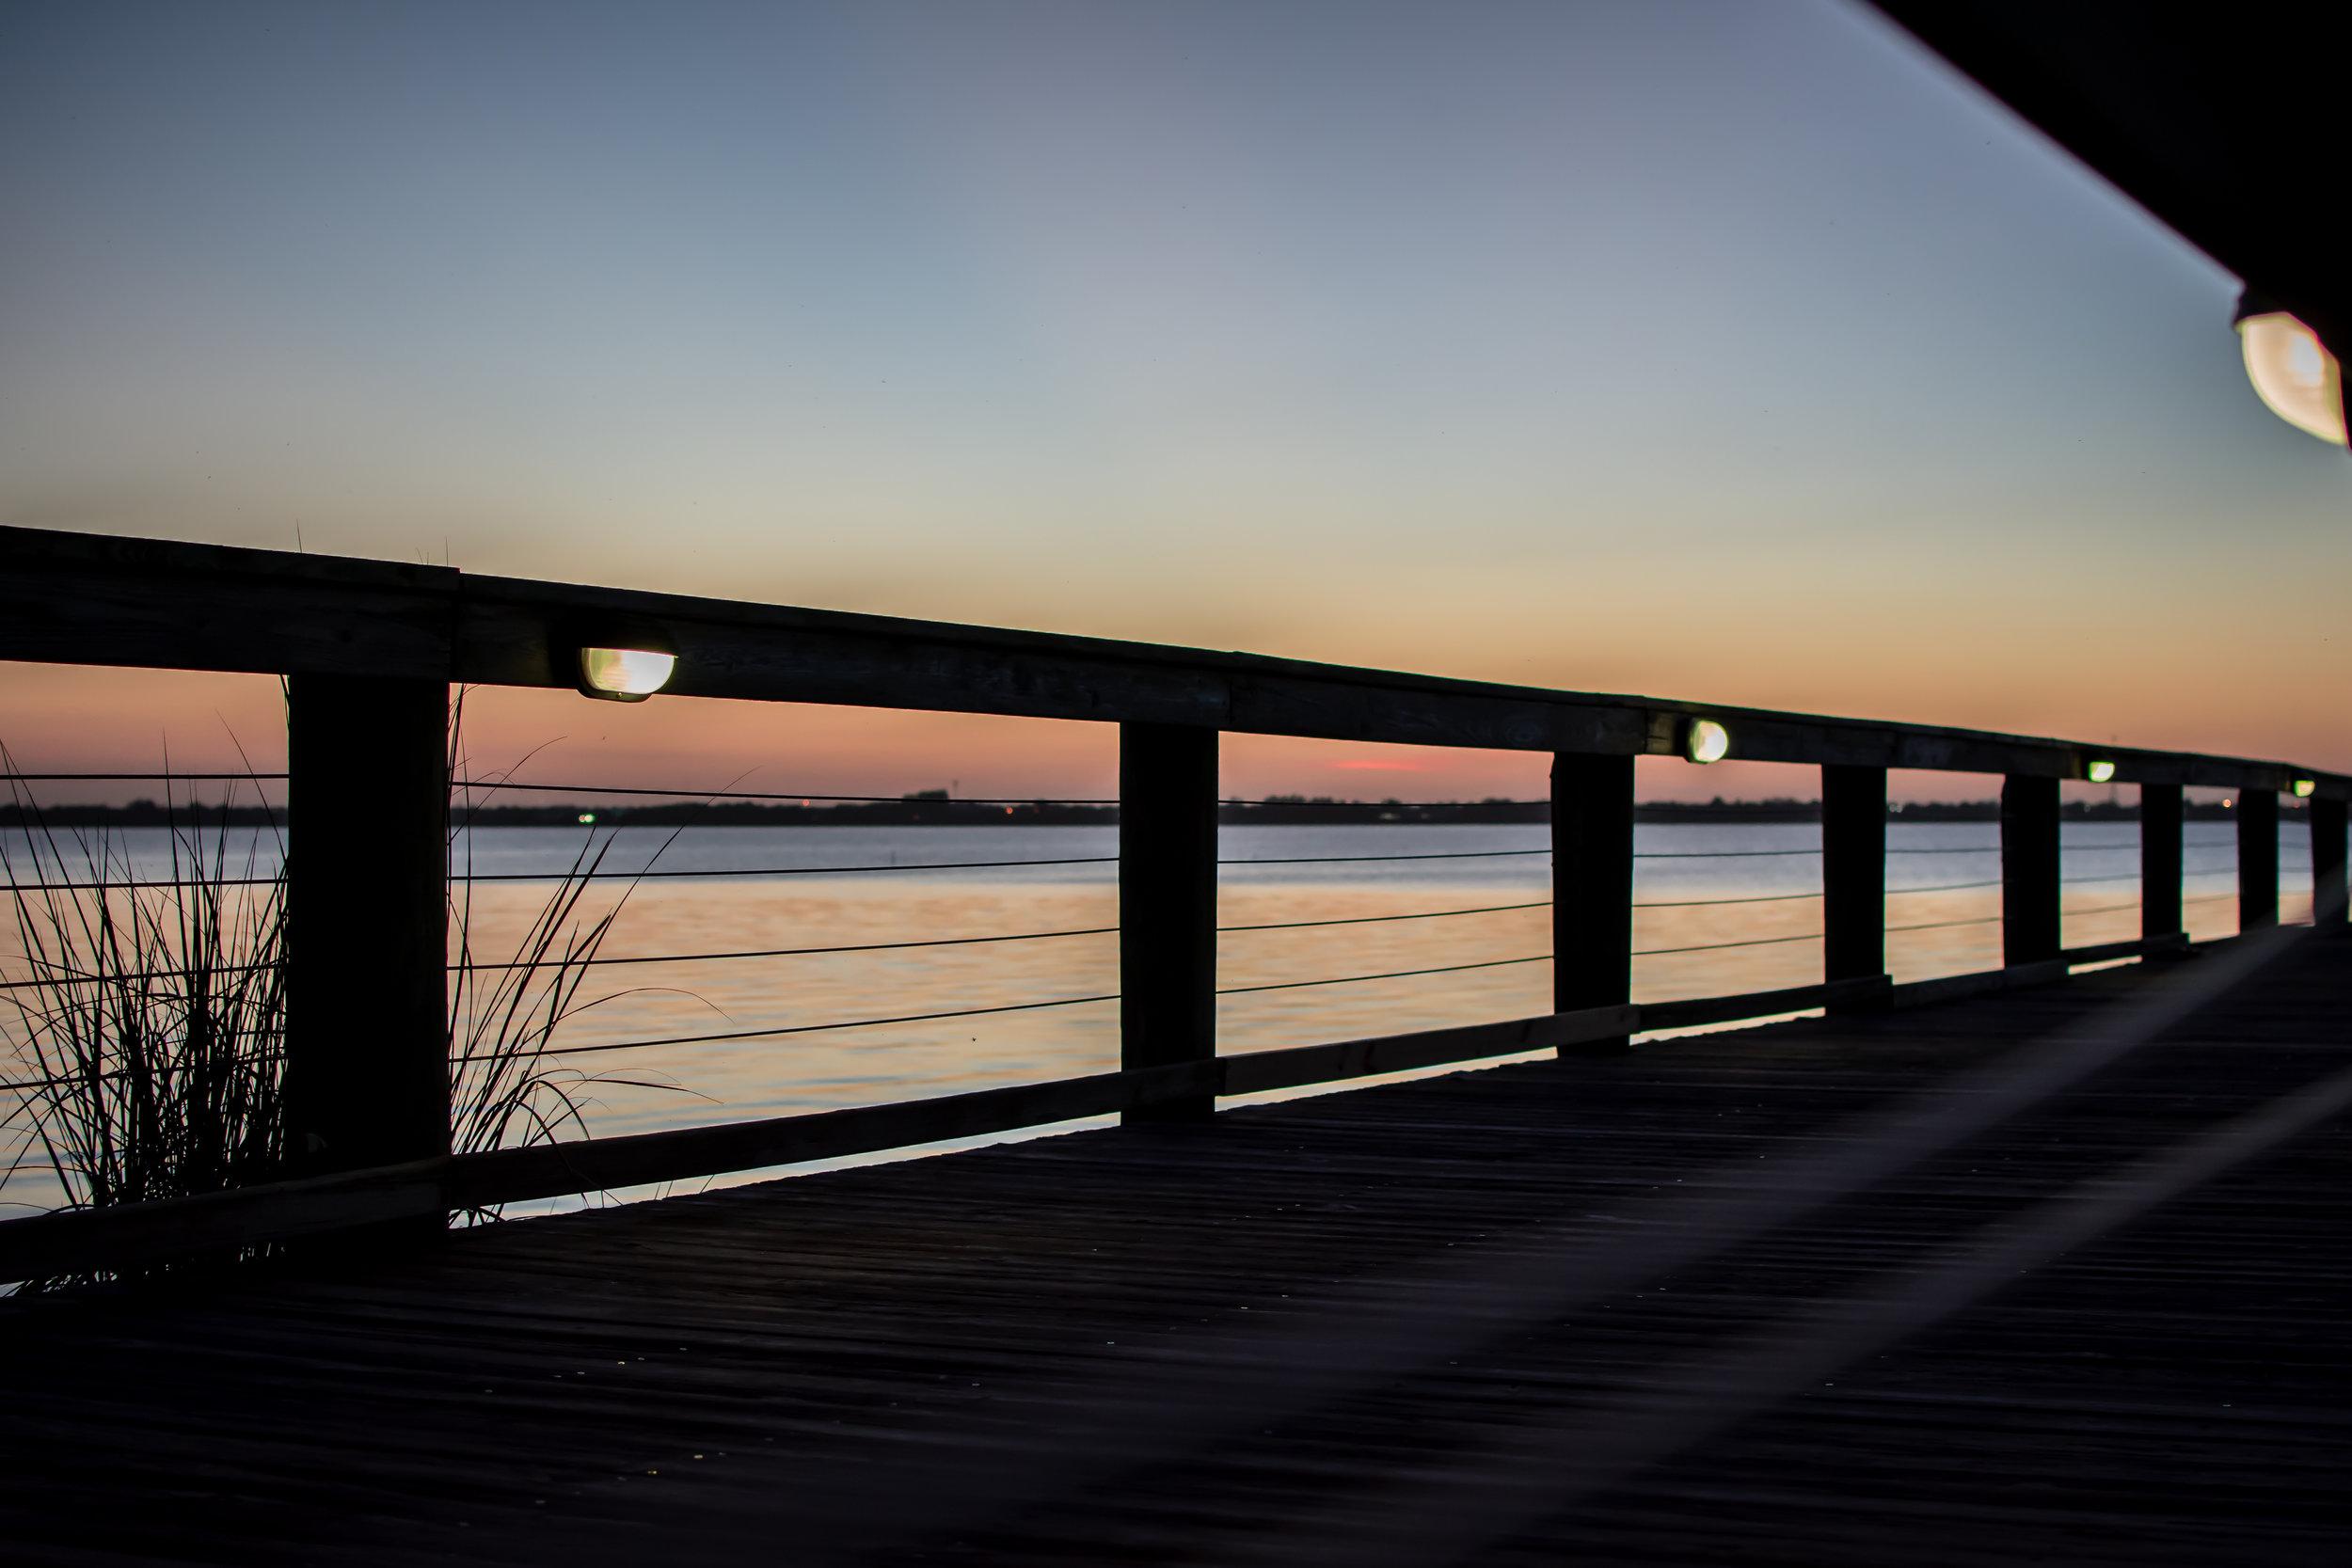 melbourne-beach-sunsets-yanitza-ninett-photography-4